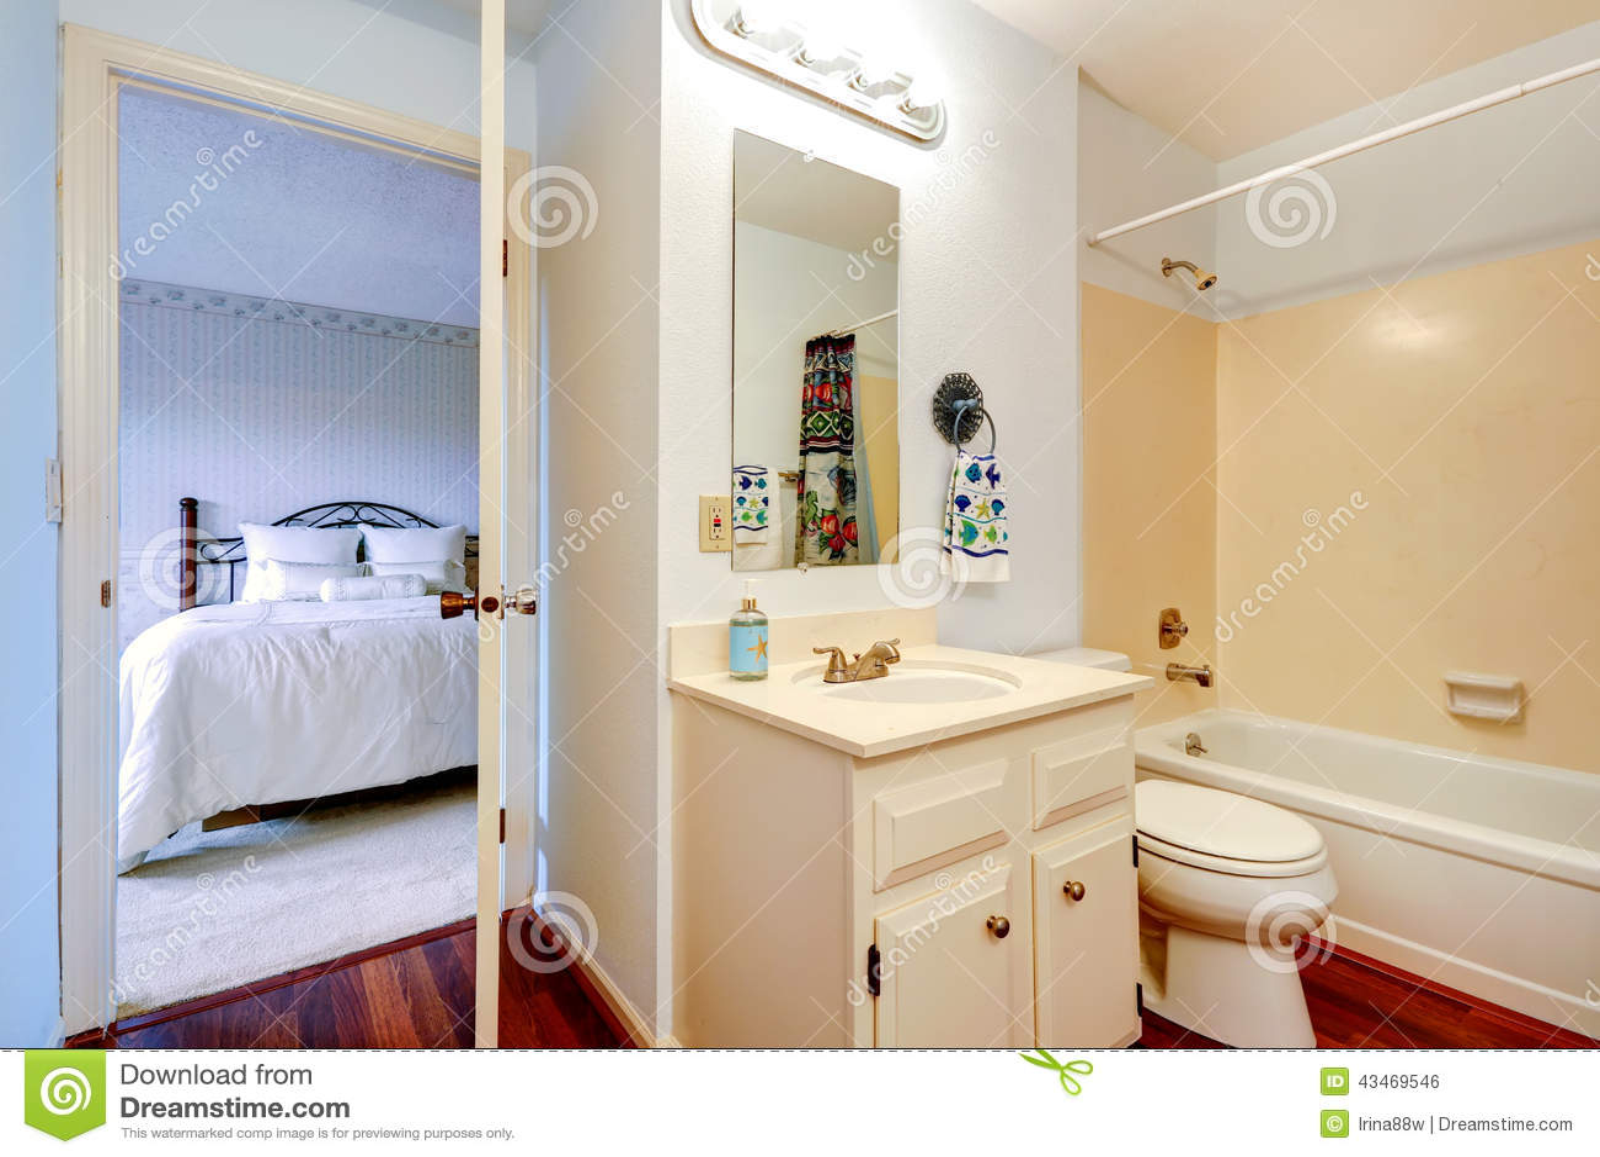 Bathoom interior in masterbedroom stock photo image for Small bathroom interior